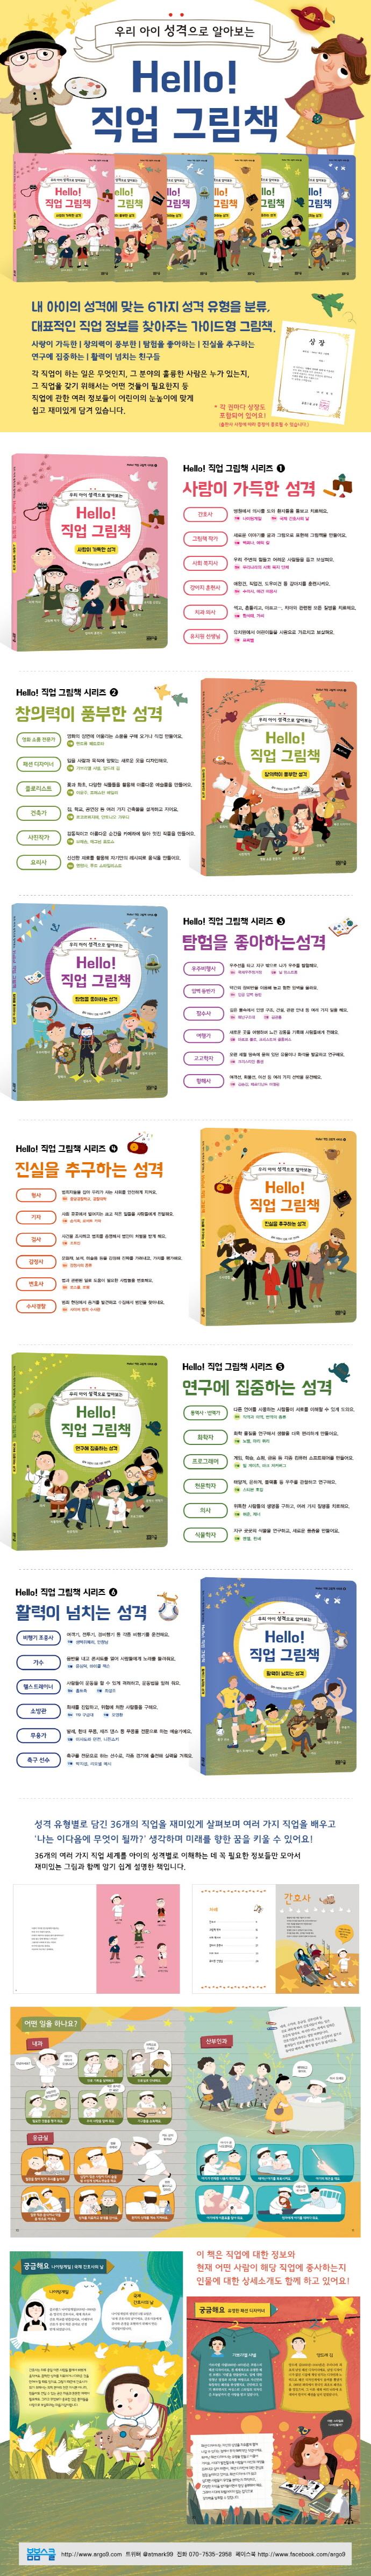 Hello! 직업 그림책: 사랑이 가득한 성격(우리 아이 성격으로 알아보는)(Hello! 직업 그림책 시리즈 1)(양? 도서 상세이미지